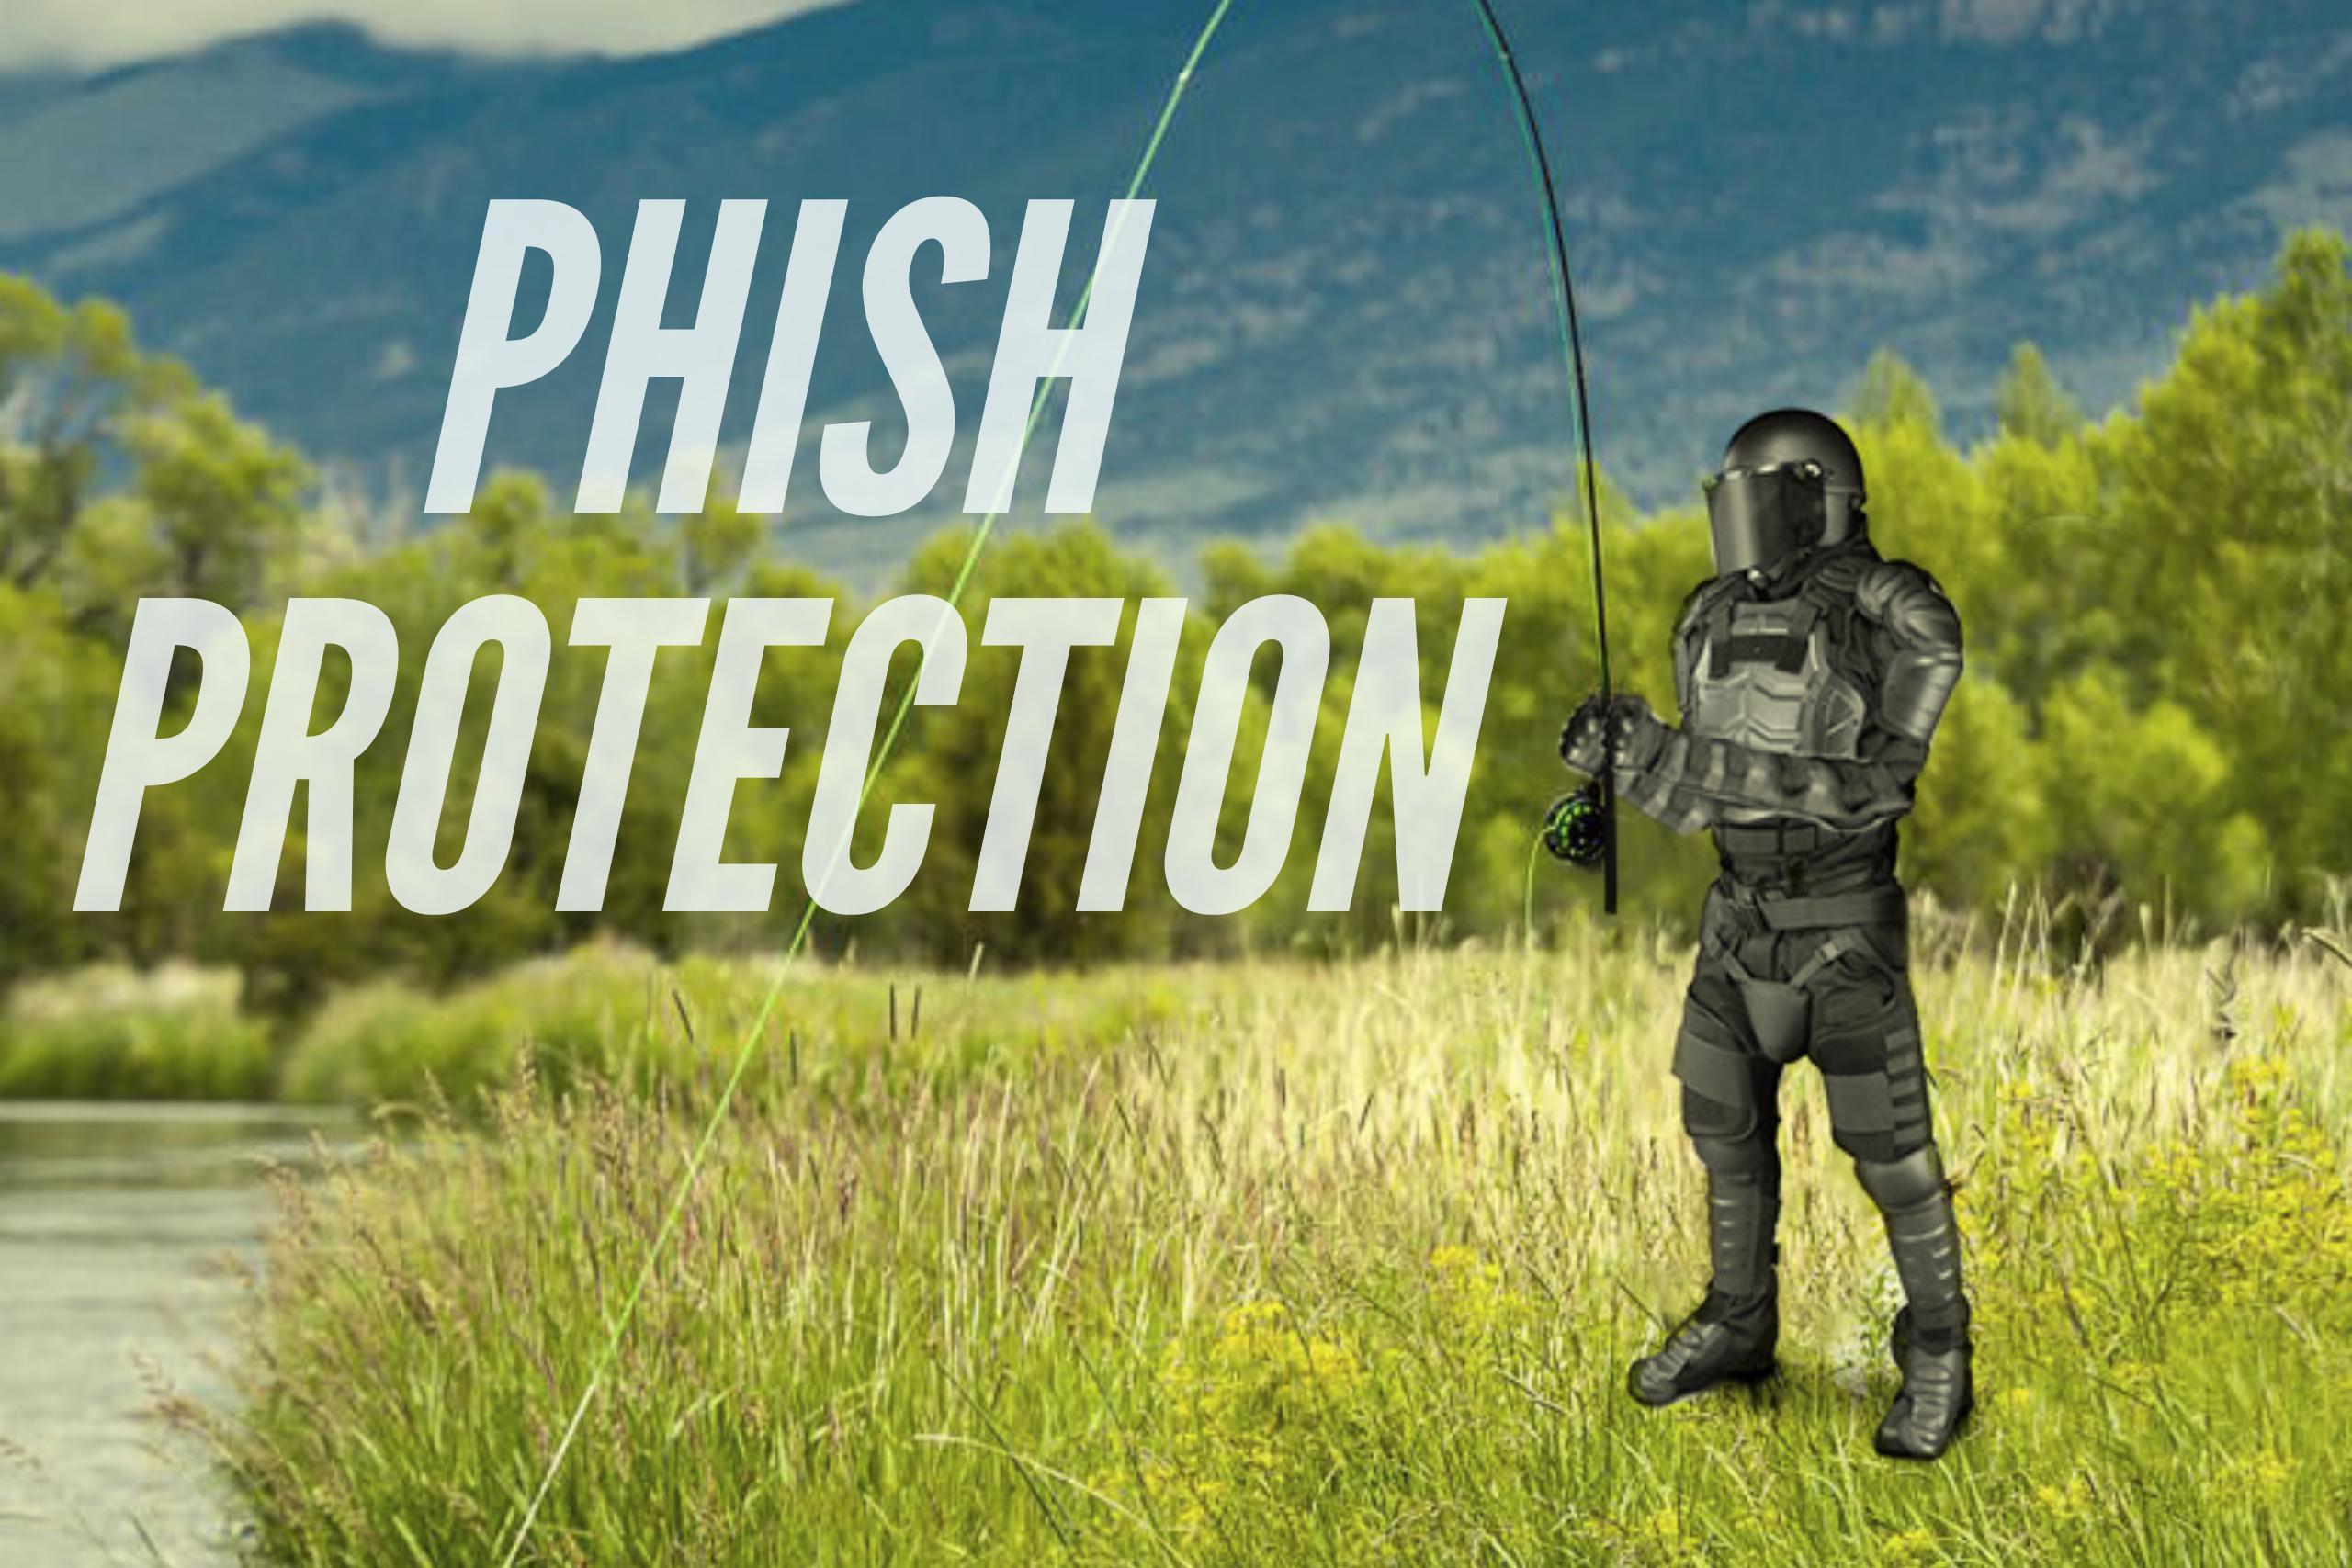 Phish protection